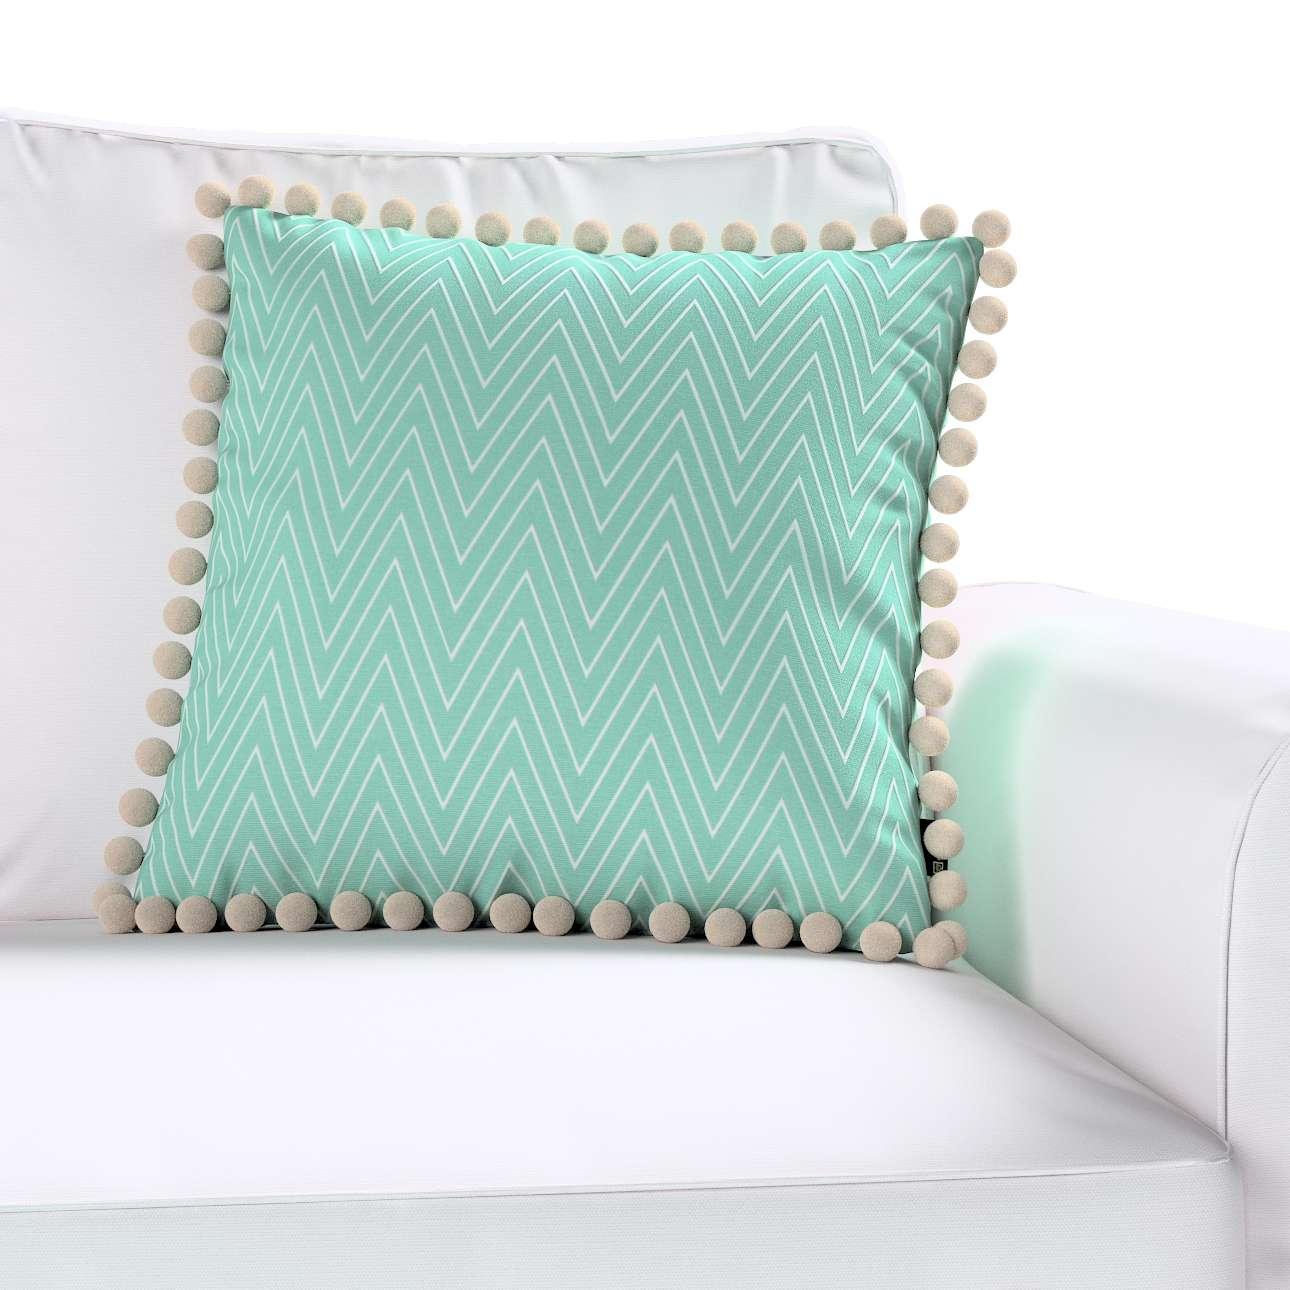 Poszewka Wera na poduszkę 45 x 45 cm w kolekcji Brooklyn, tkanina: 137-90